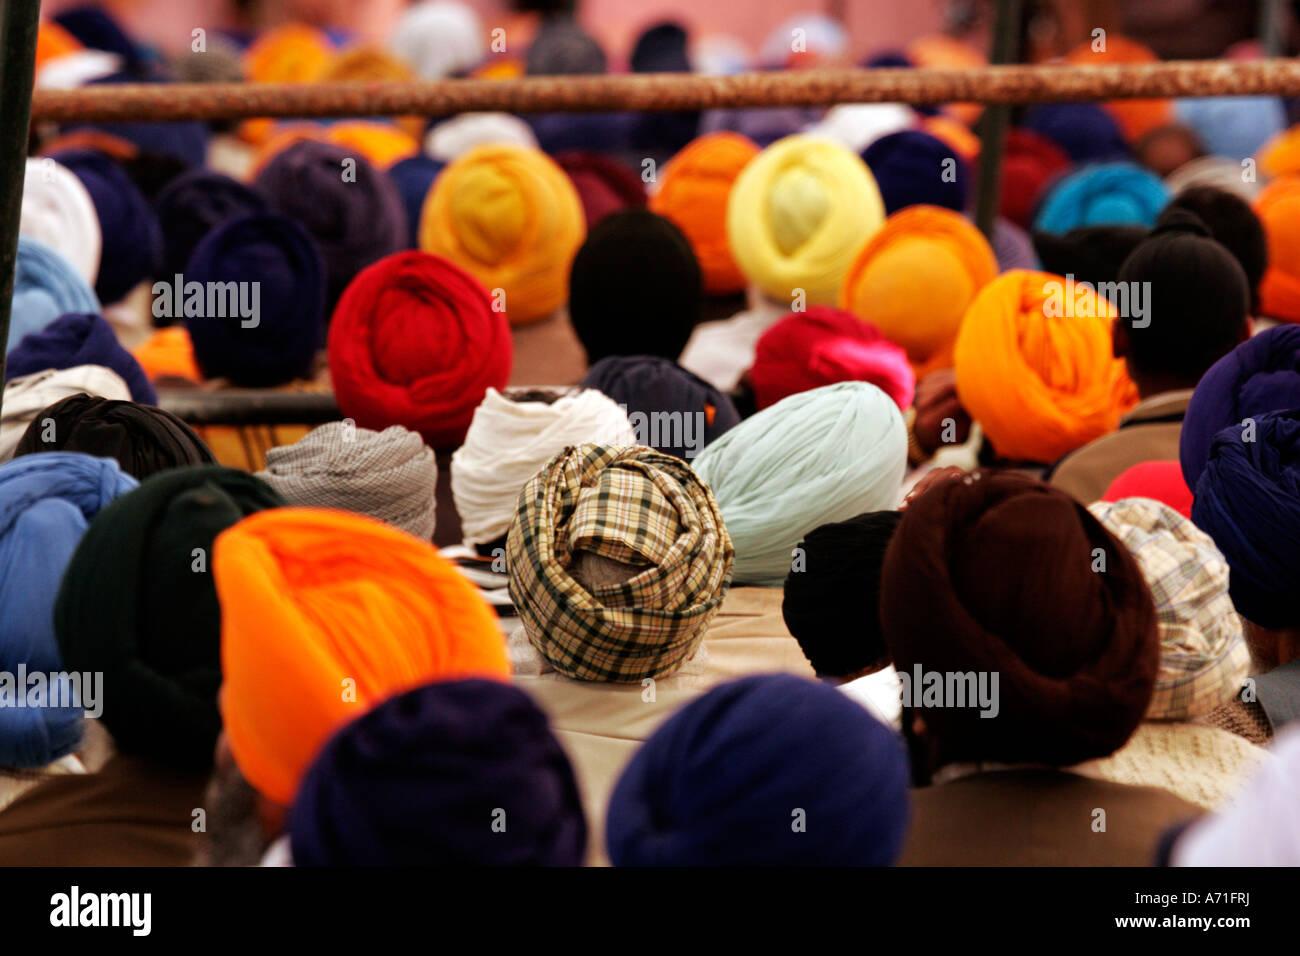 Group of Sikhs joined at Anand Pur Sahib guruwara on the occasion of Baisakhi, Punjab India Stock Photo